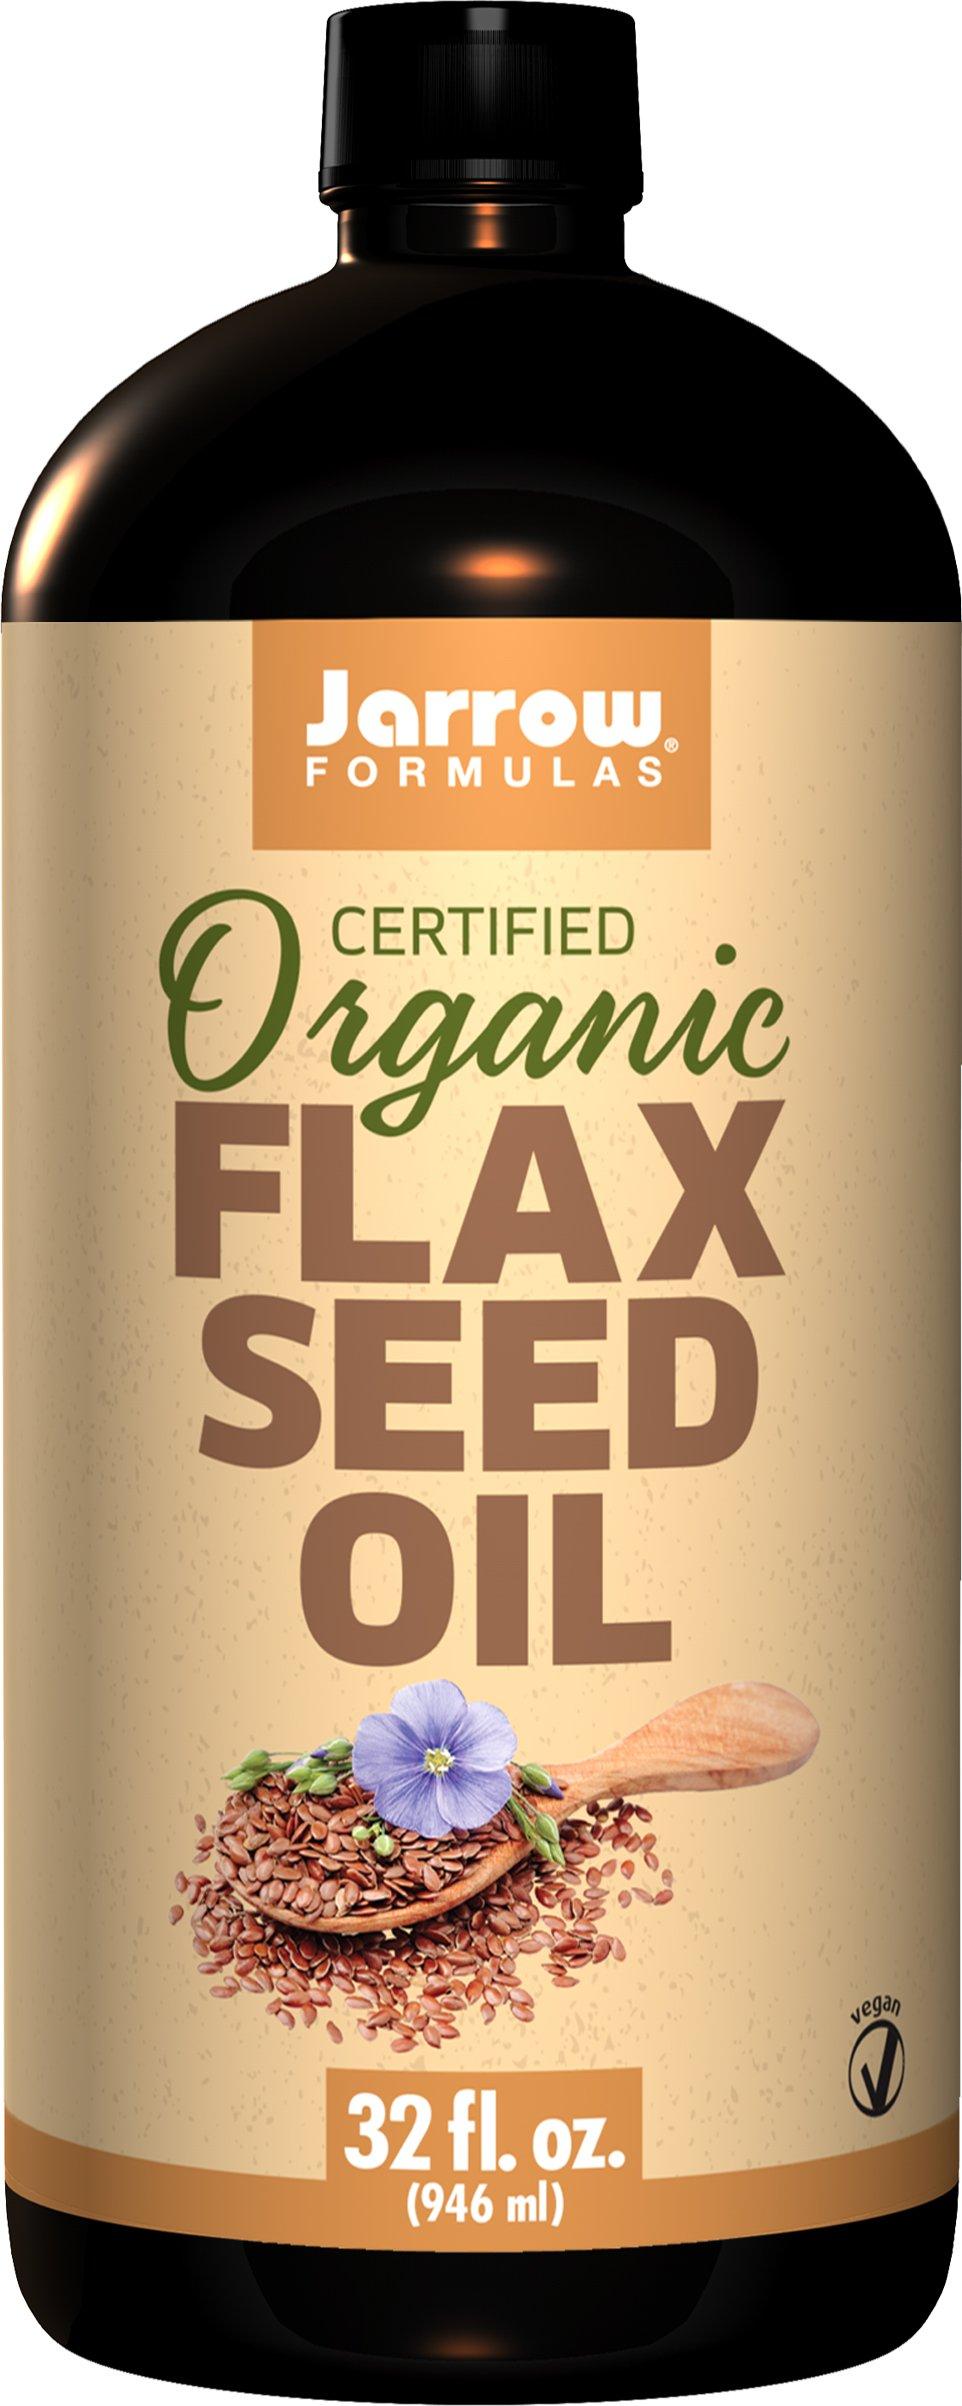 Jarrow Formulas Certified Organic Flax Seed Oil 32 Fl ounces. Pack of 8 Bottles.